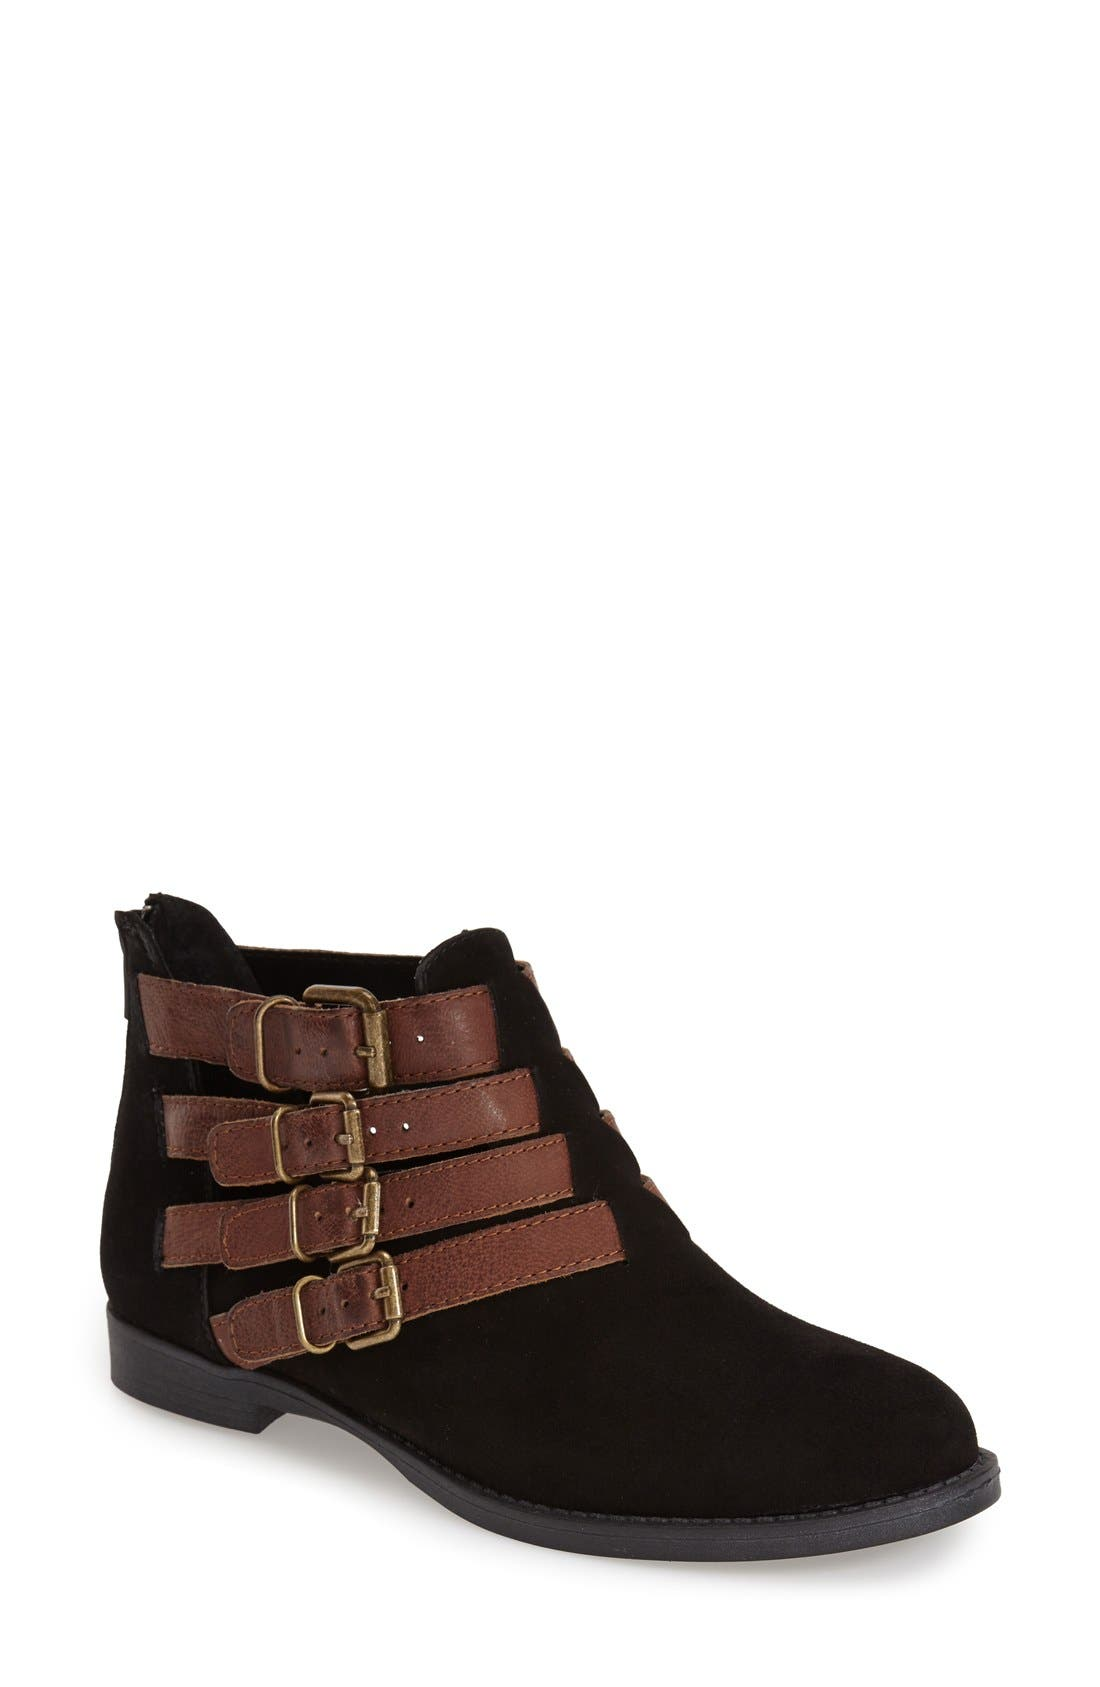 Main Image - Bella Vita 'Ronan' Buckle Leather Bootie (Women) (Online Only)